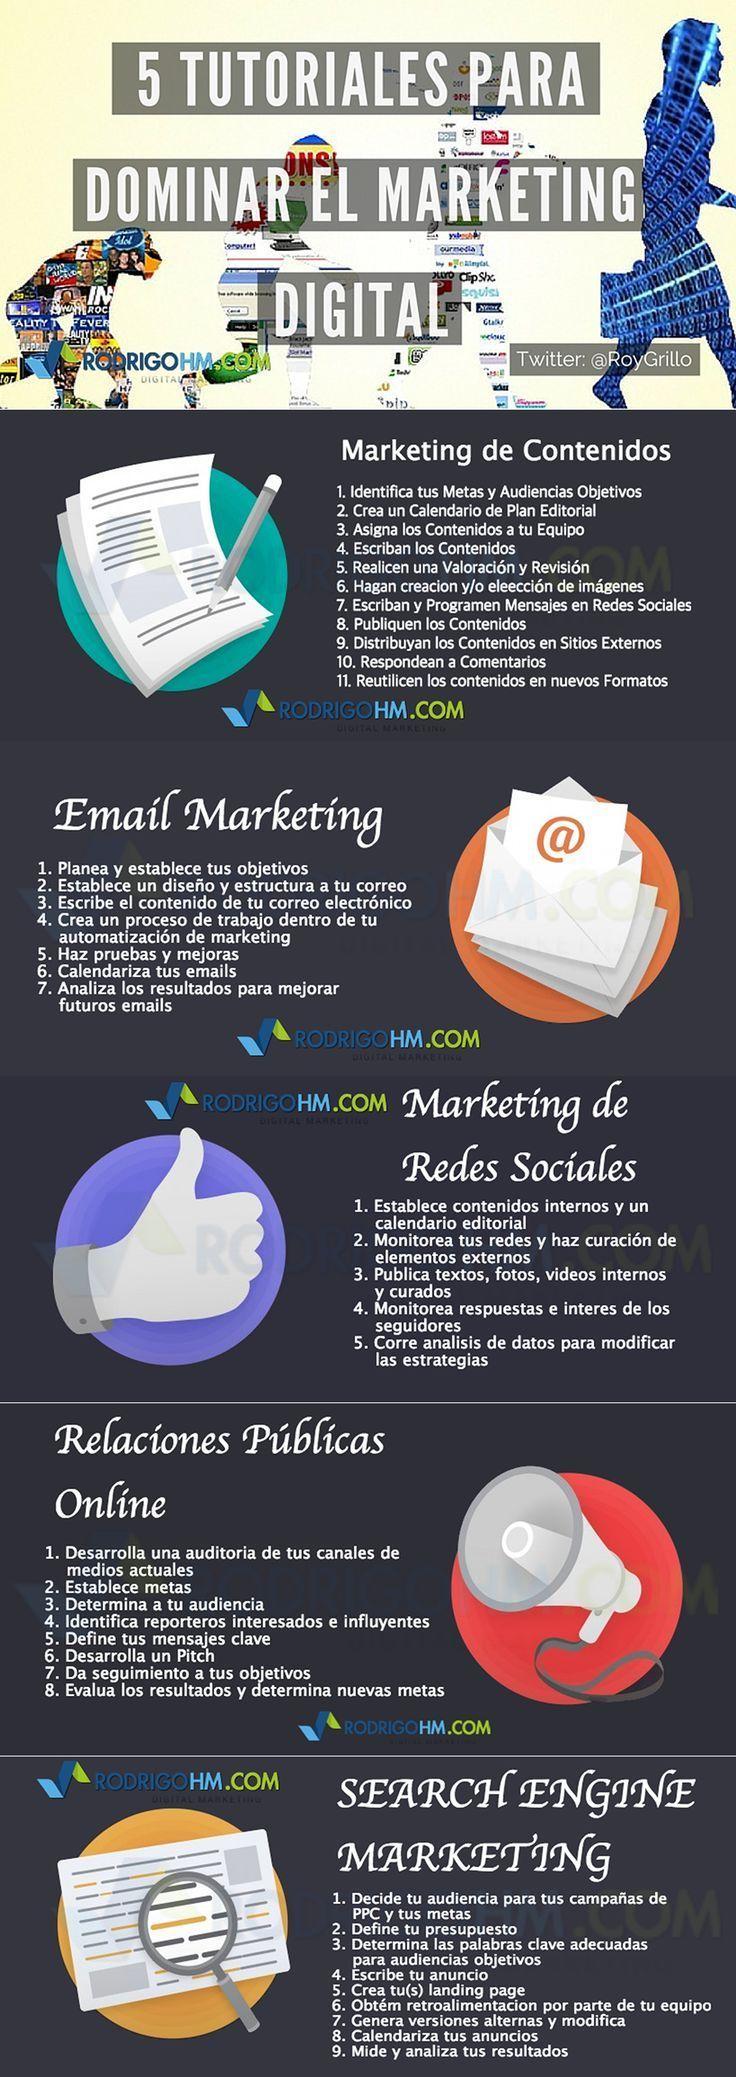 5 tutoriales para dominar el Marketing Online #infografias #infographic